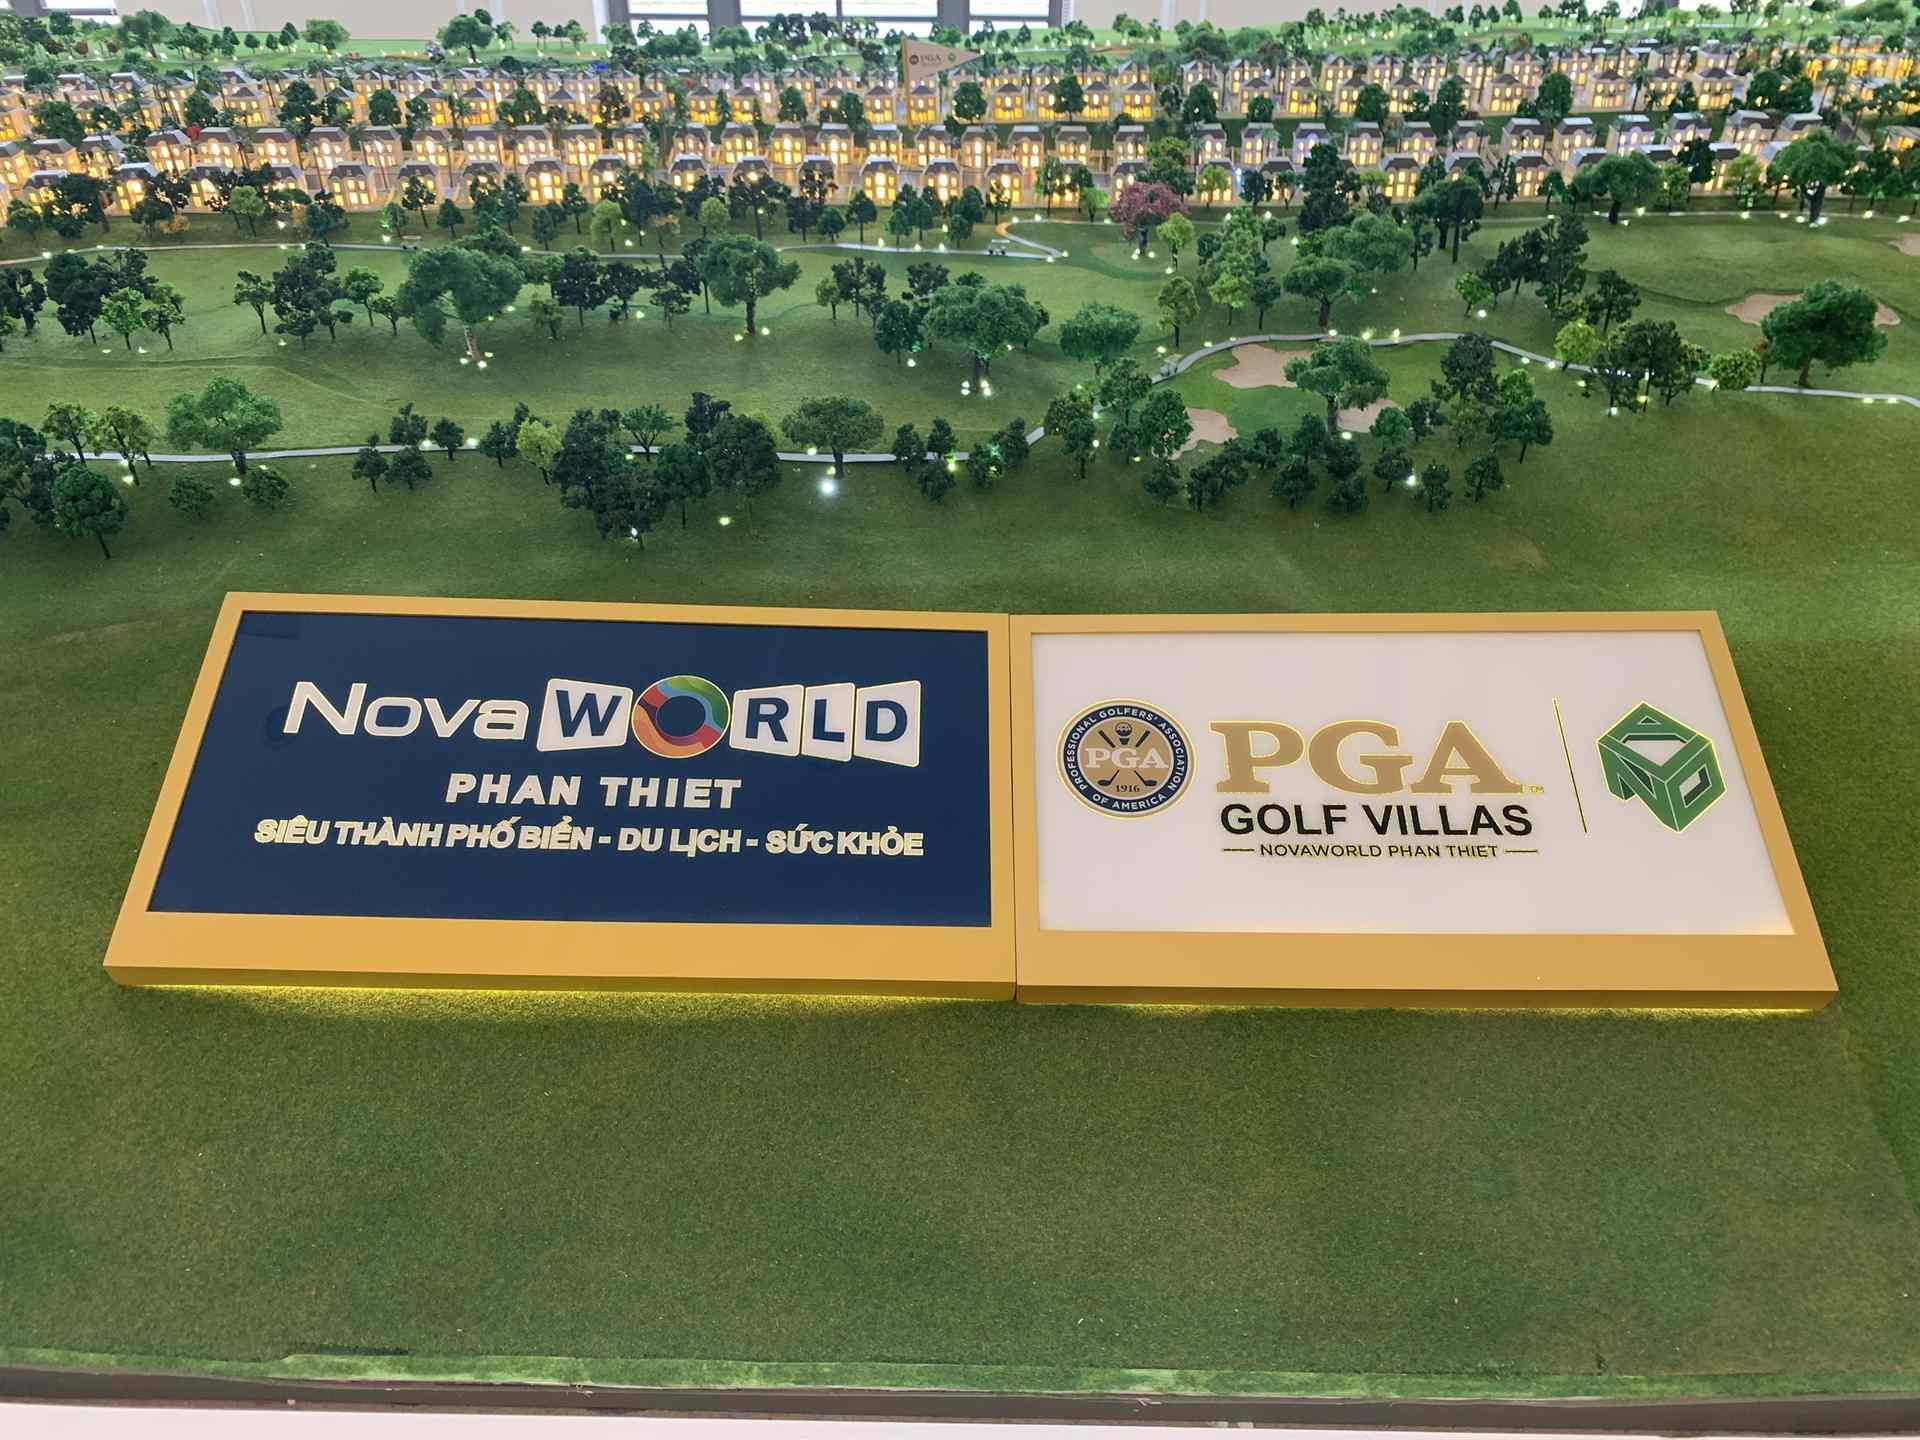 sa-ban-villas-golf-novaworld-phan-thiet-tai-q2-hcm-PGA